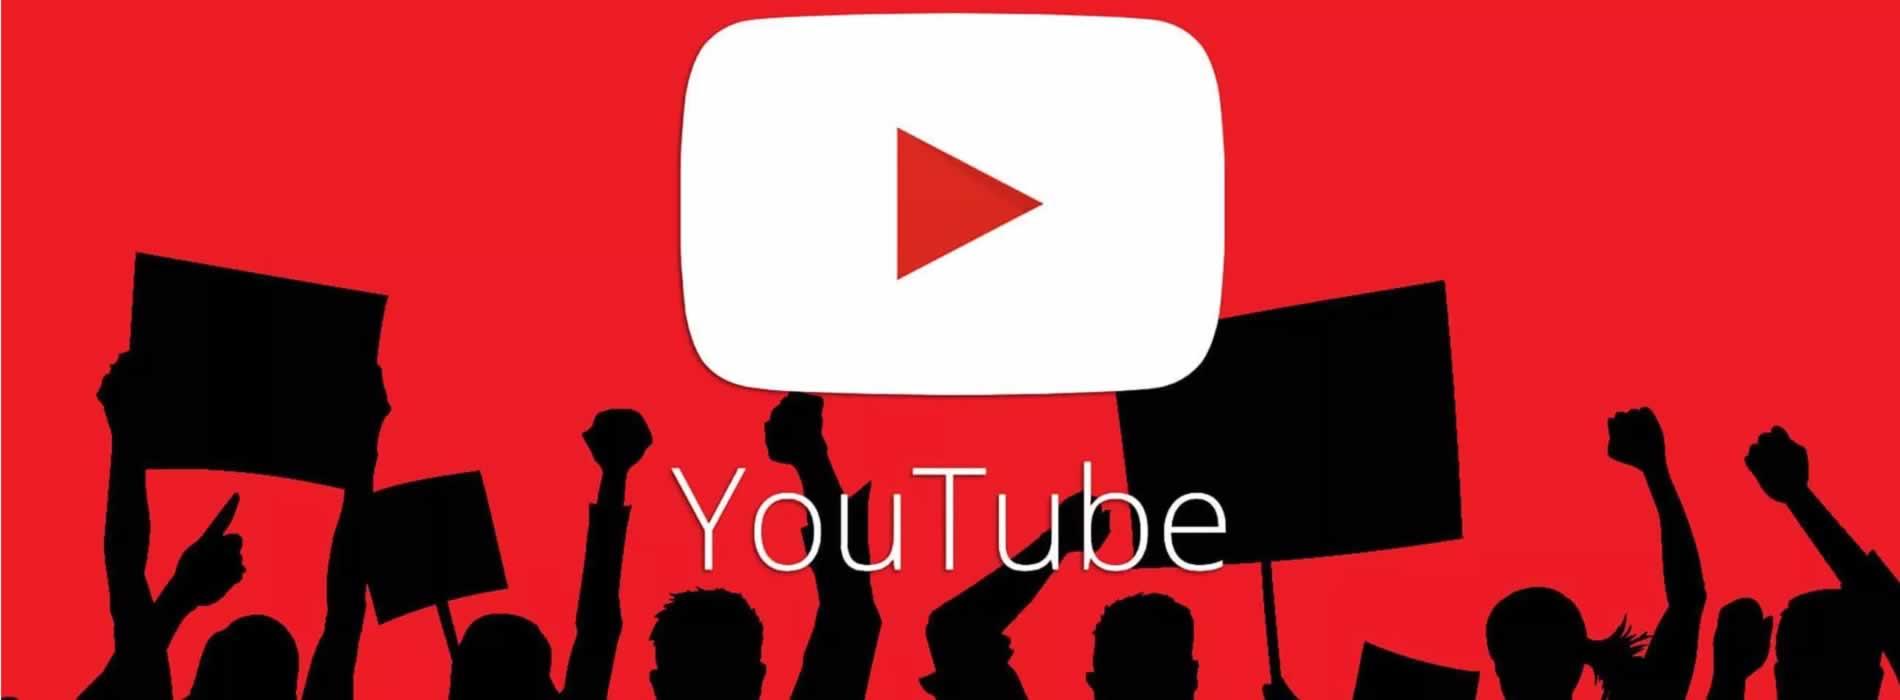 Google exclui mais de 2.500 canais chineses do YouTube